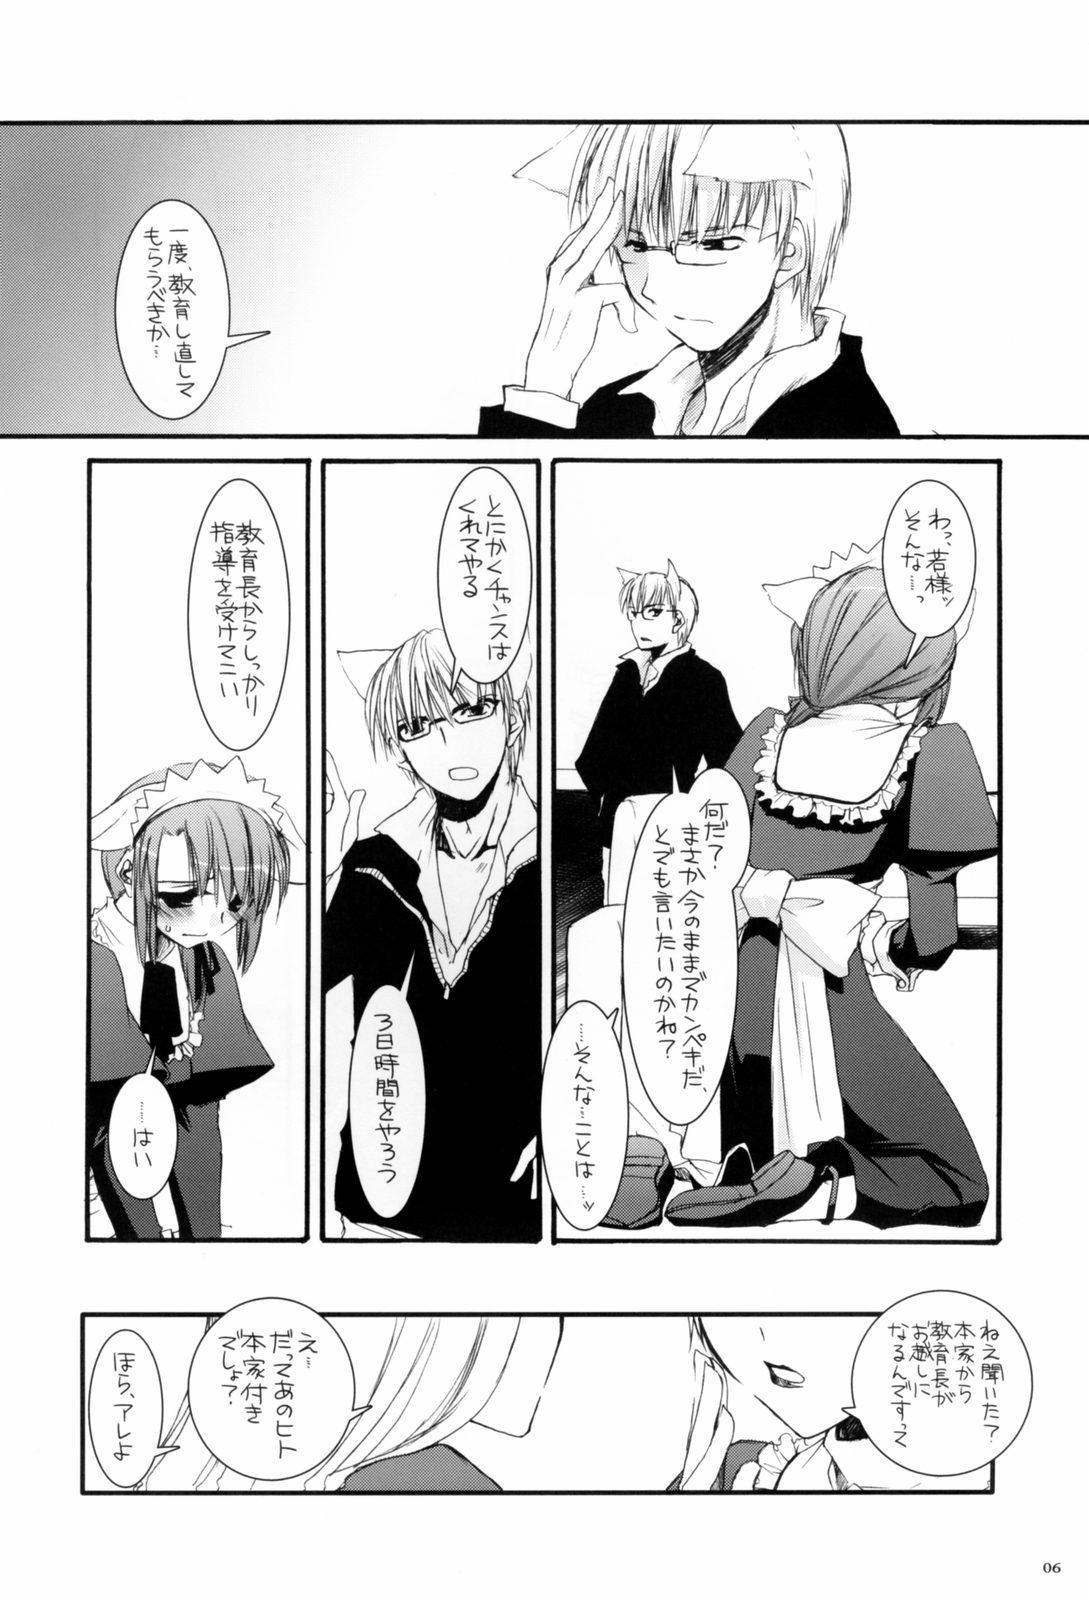 Seifuku Rakuen 13 - Costume Paradise 13 4